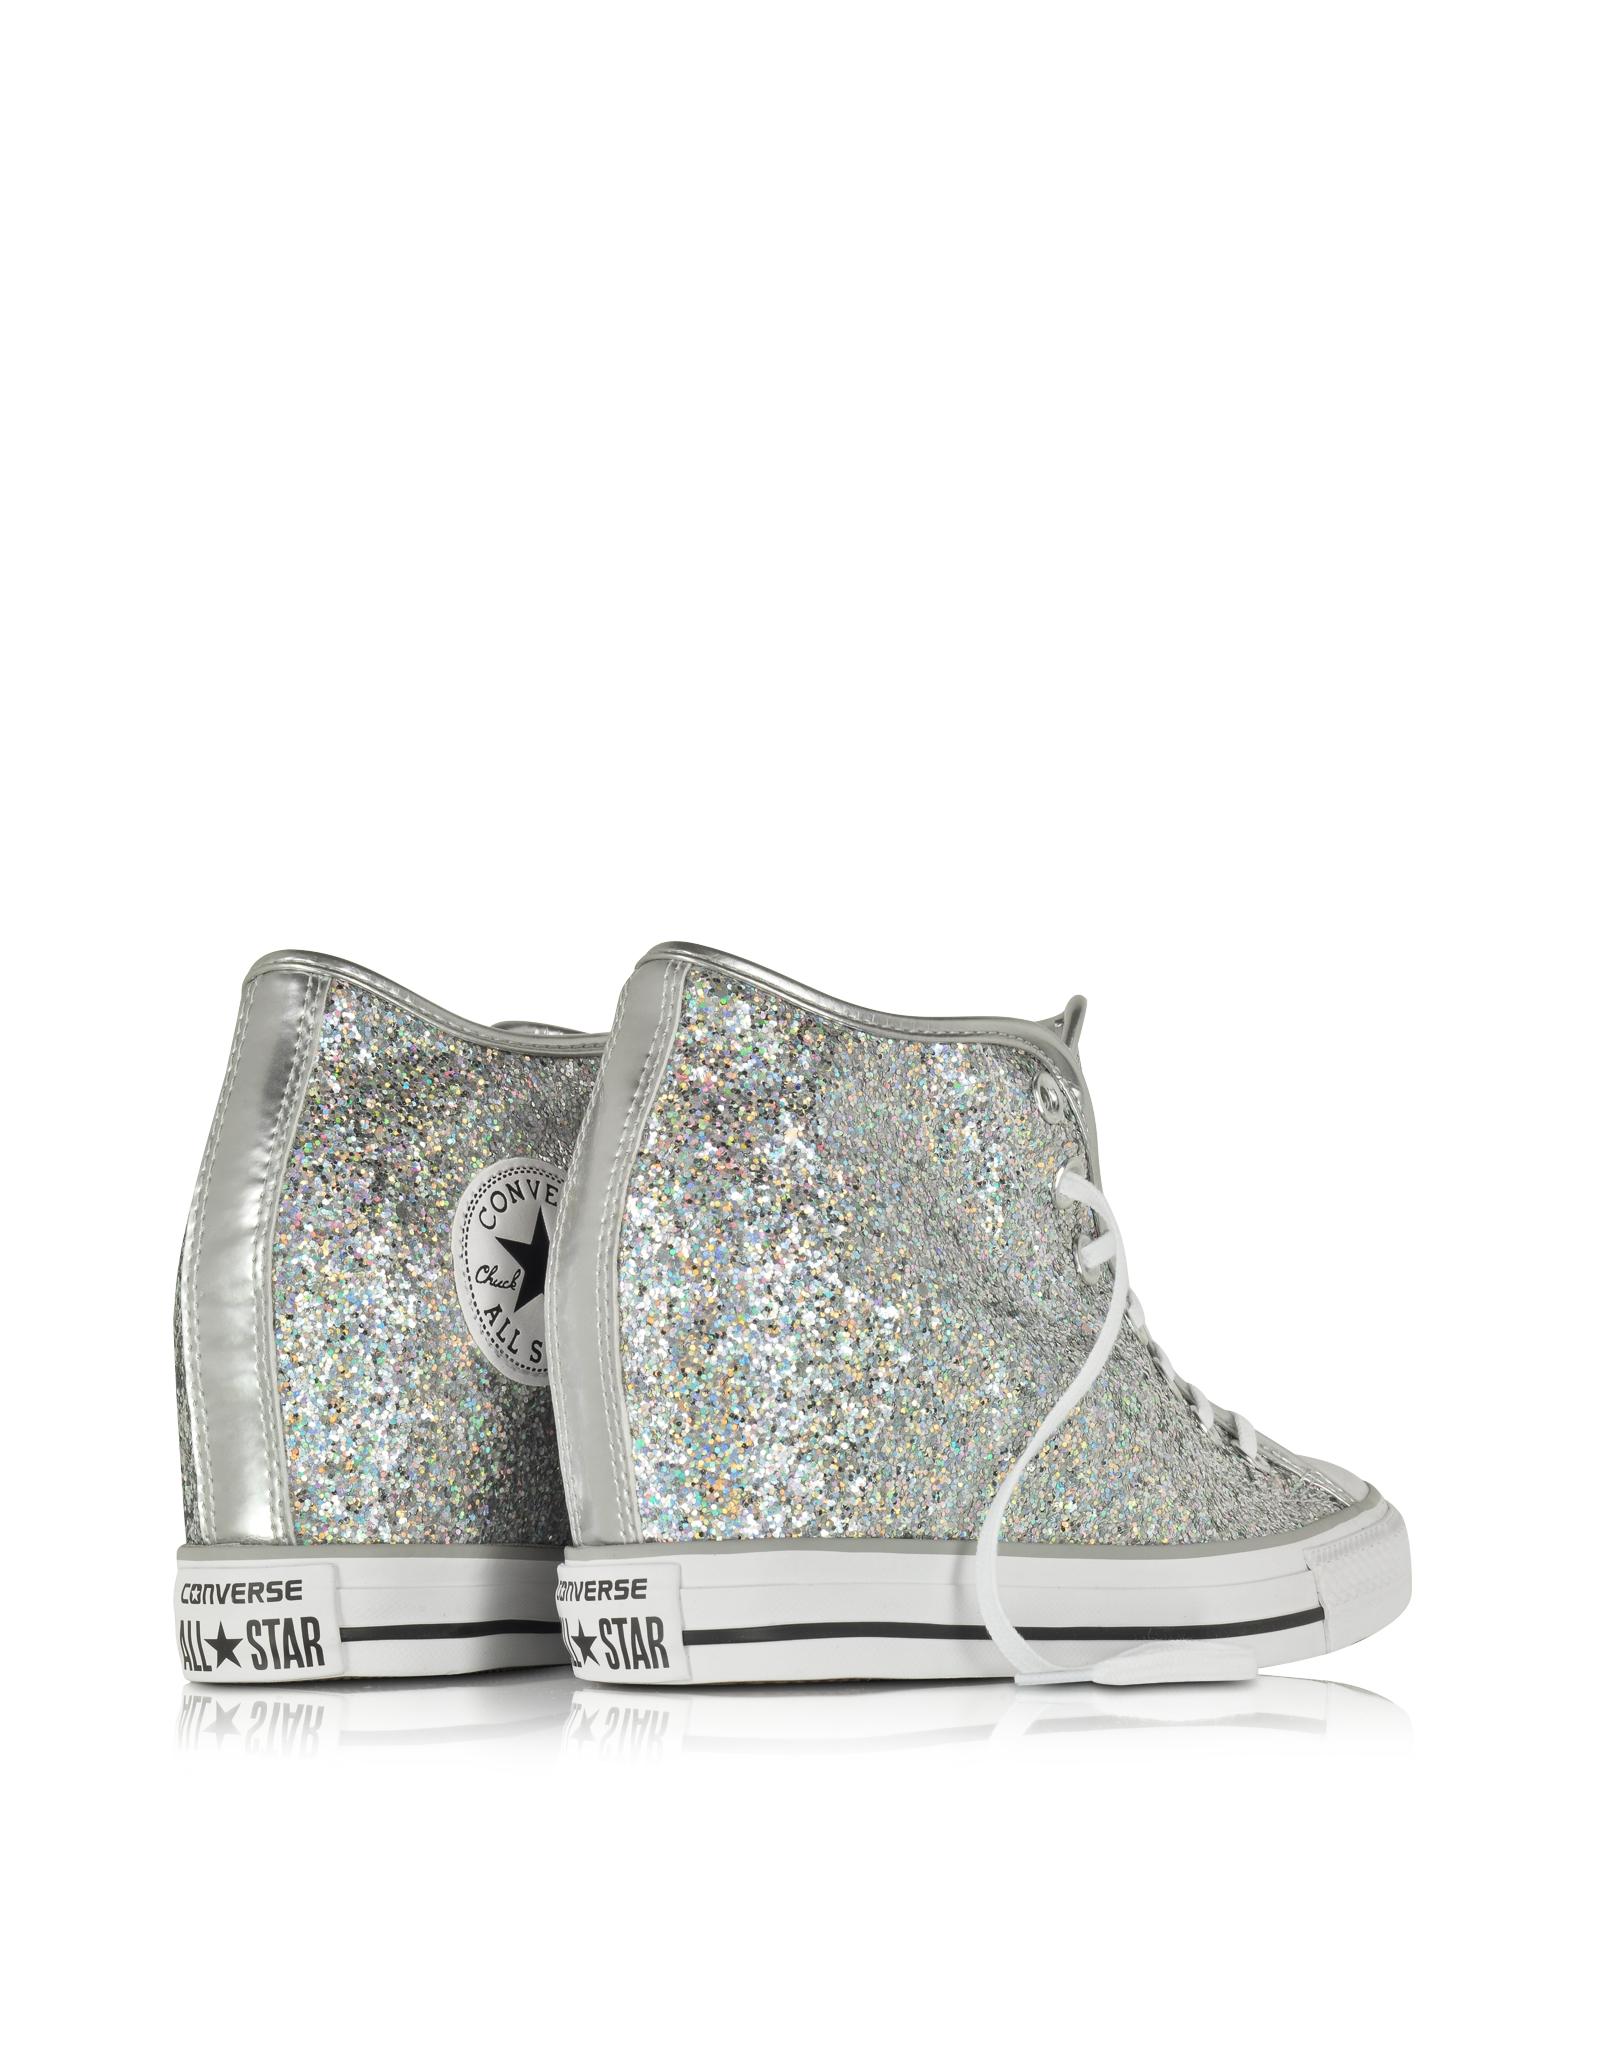 9616e91ccbf Lyst - Converse All Star Mid Lux Glitter Wedge Sneaker in Gray